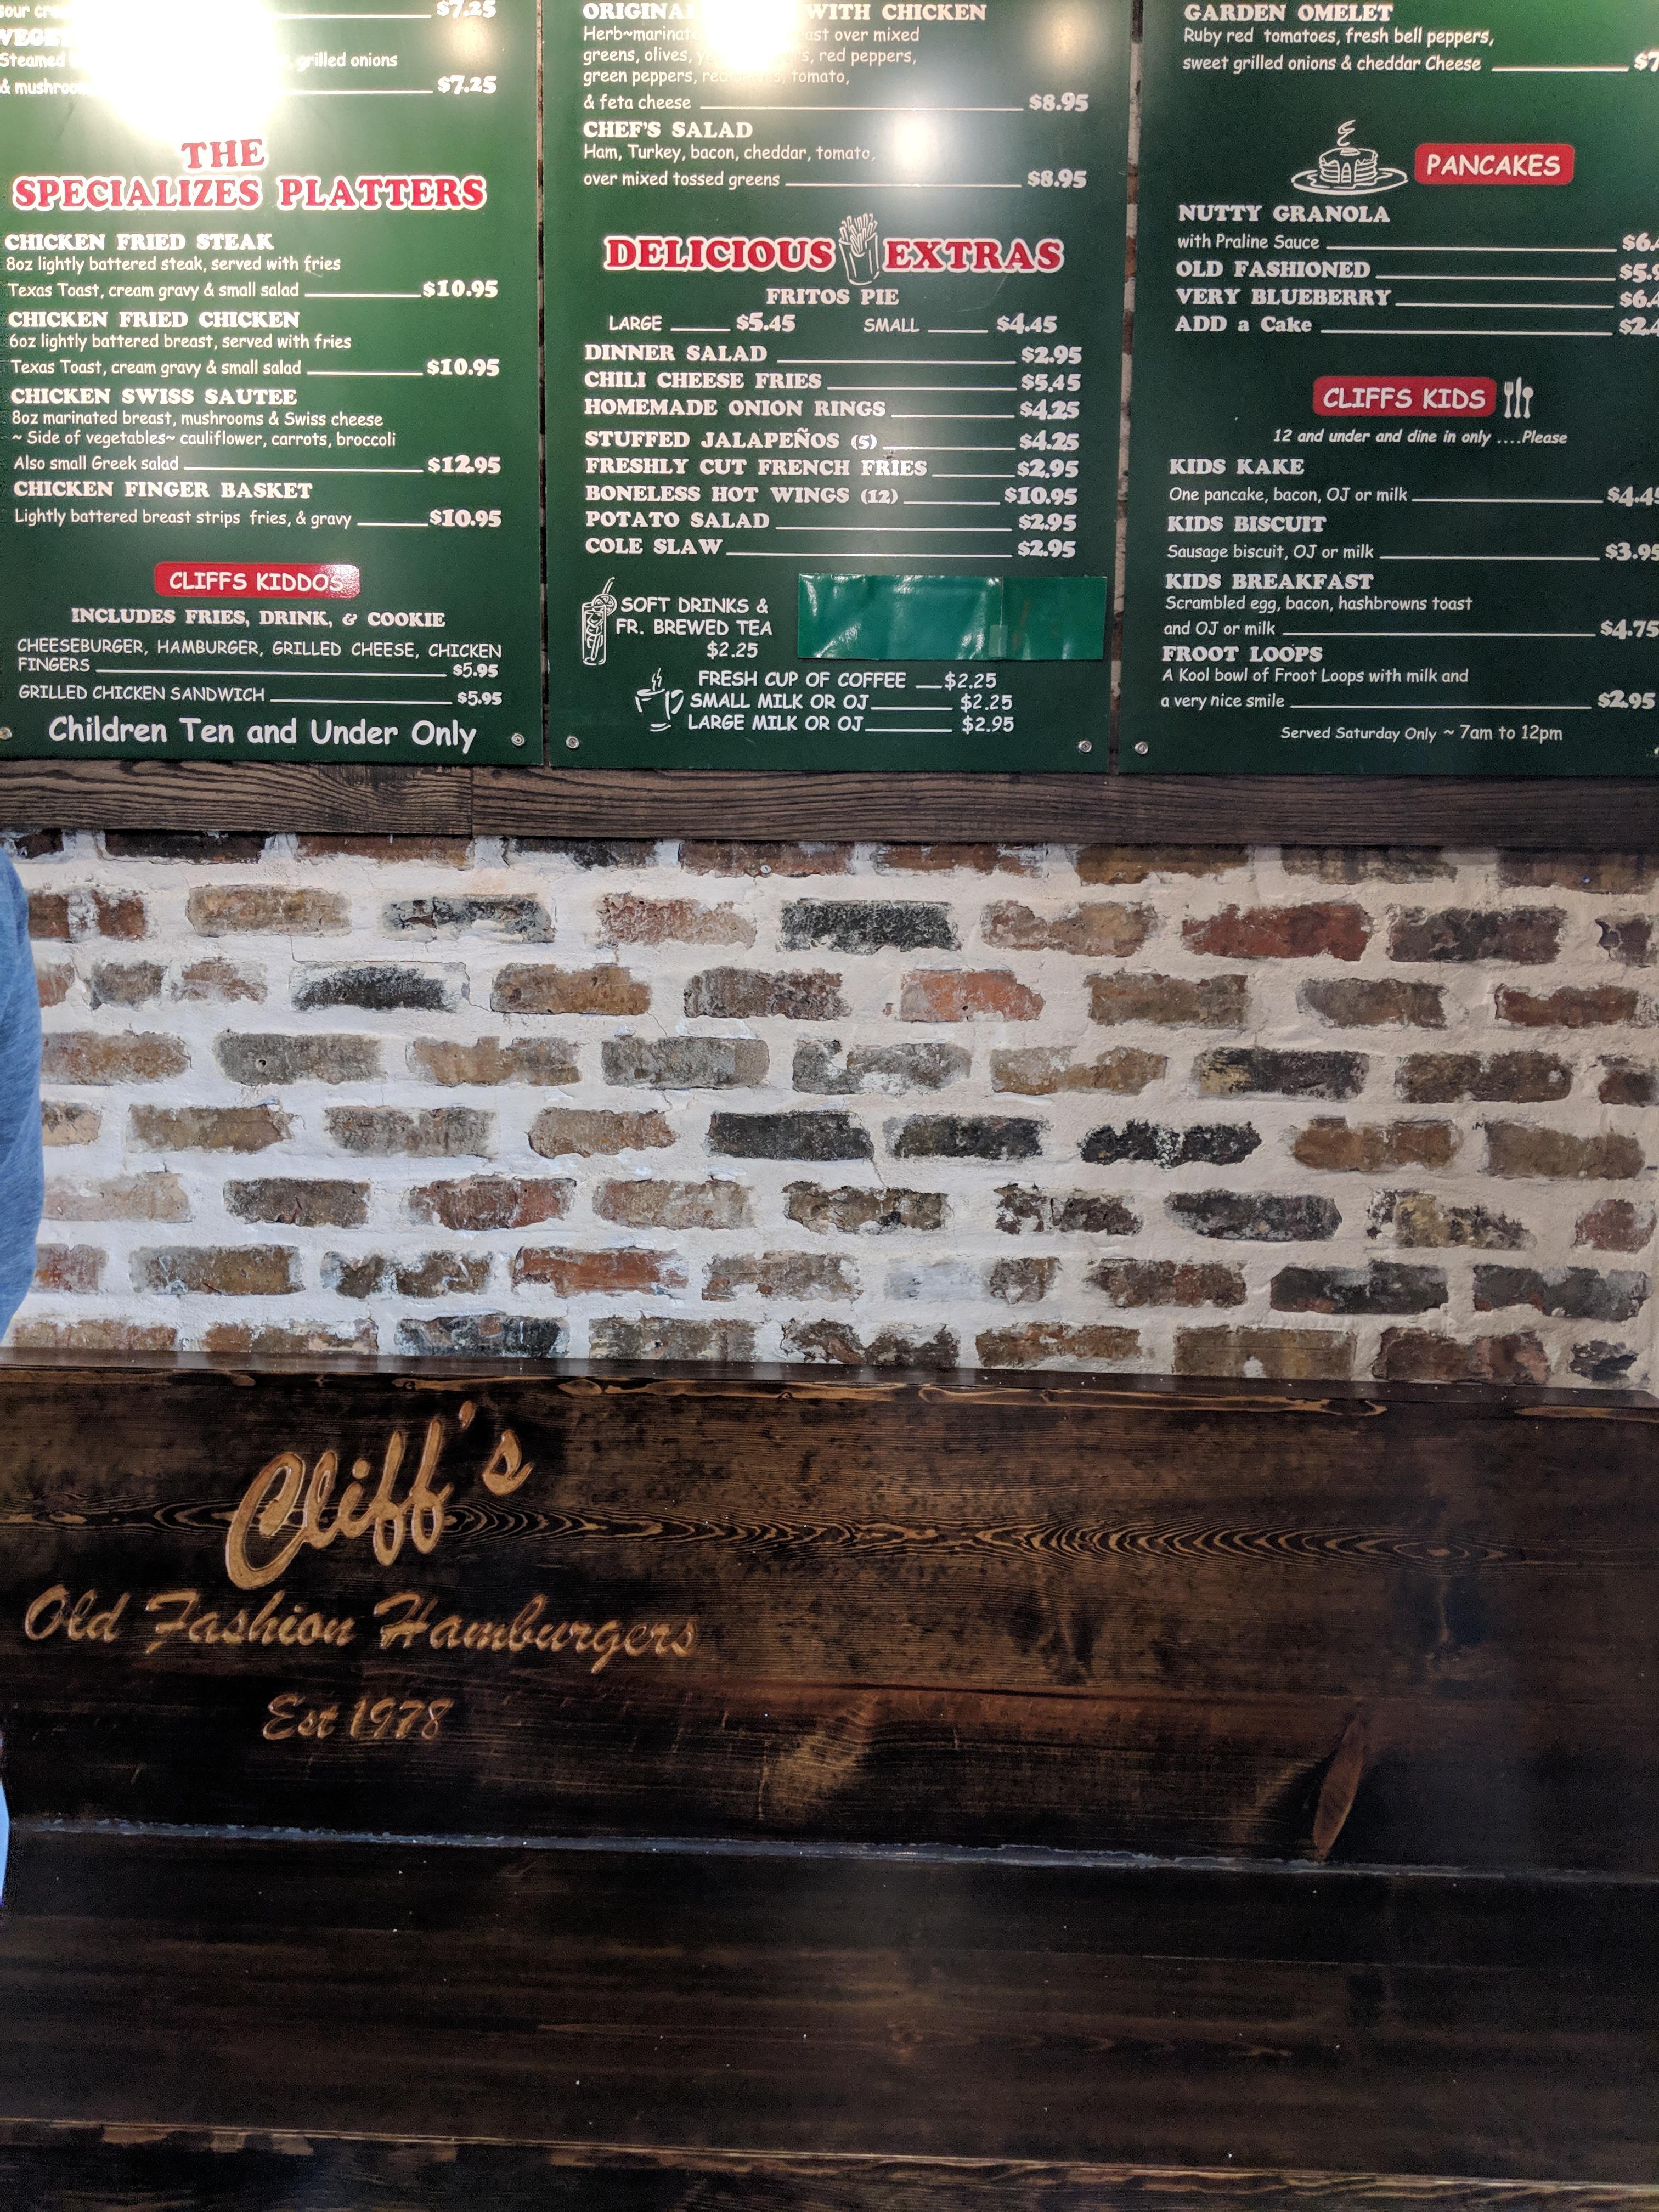 Cliff's Old Fashioned Hamburgers image 8